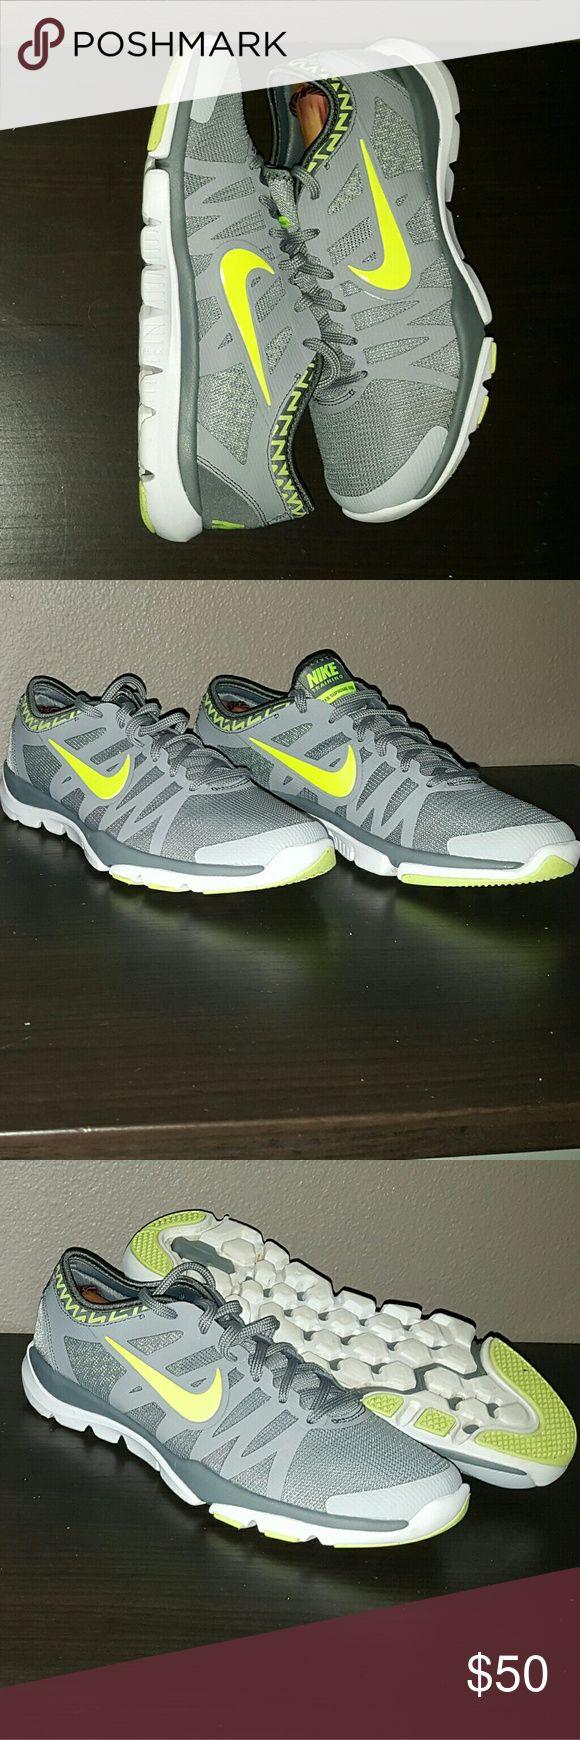 Women's Nike Flex Trainer Supreme 3 Women's Nike Flex Trainer Supreme 3 size 9 great condition Nike Shoes Athletic Shoes